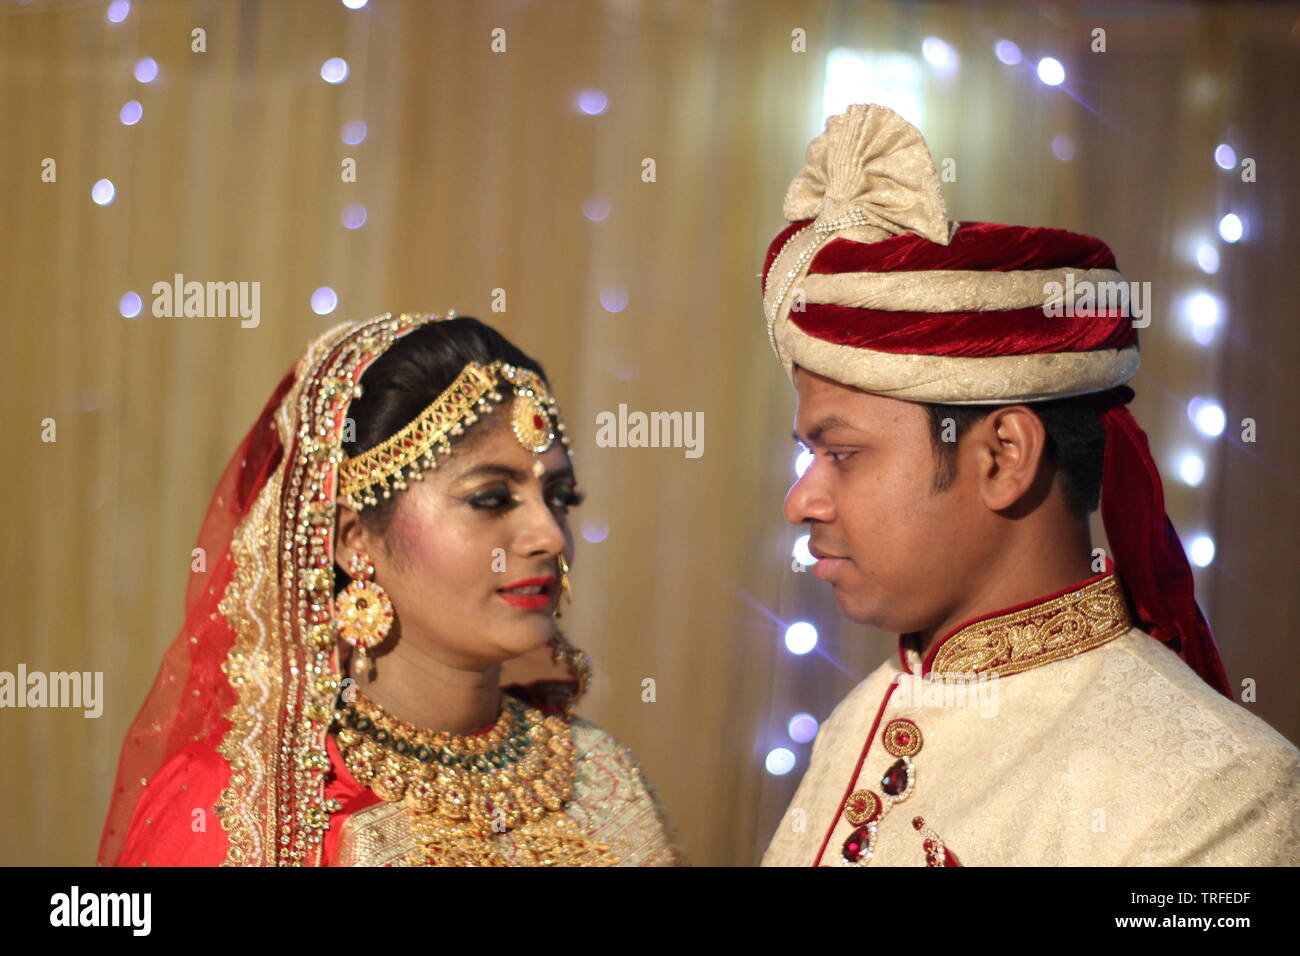 Best Wedding Photography 2019 - Stock Image